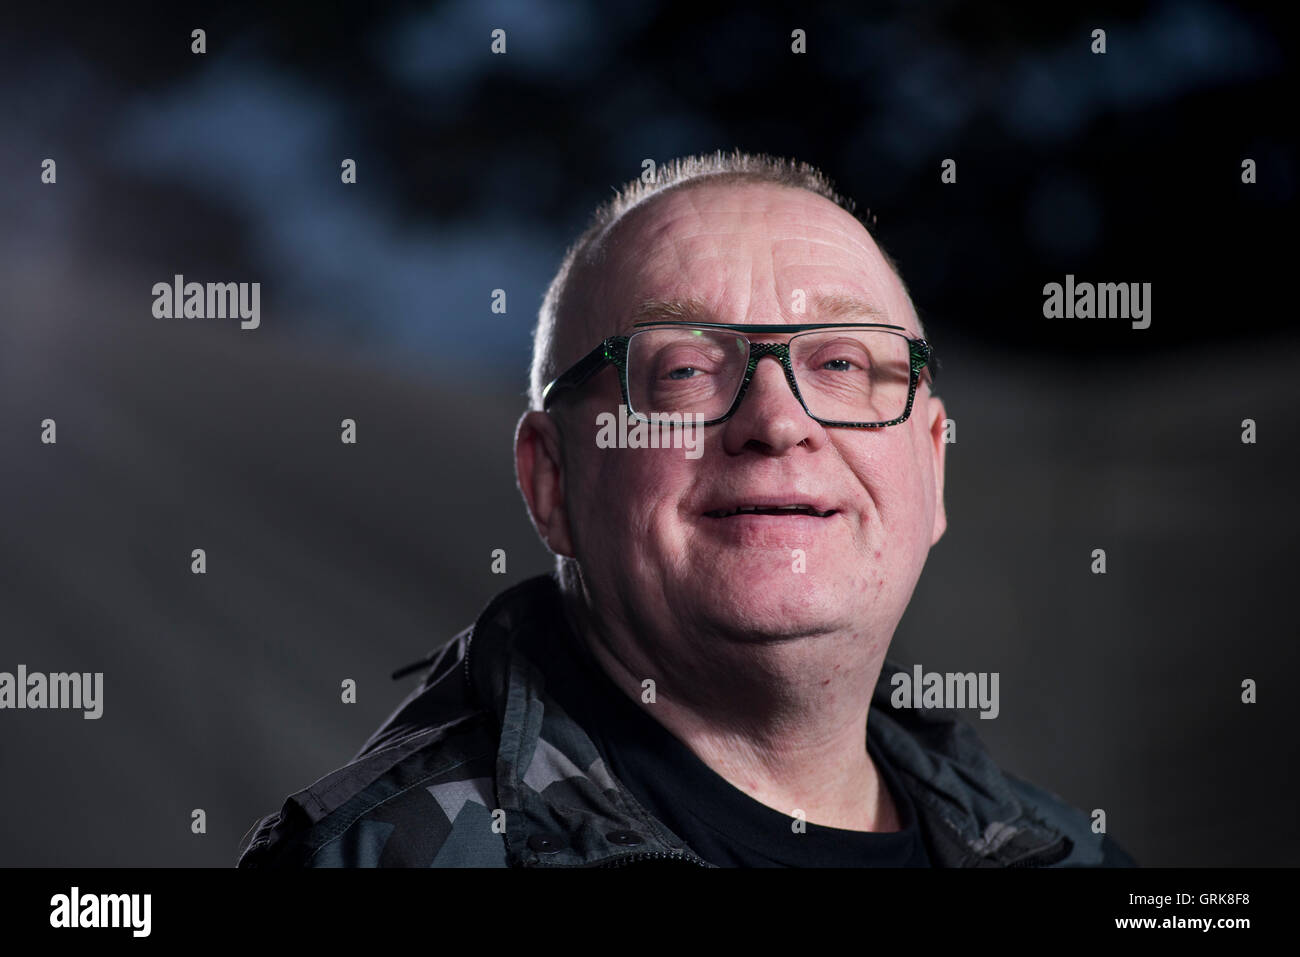 Scottish journalist, broadcaster and television executive Stuart Cosgrove. - Stock Image